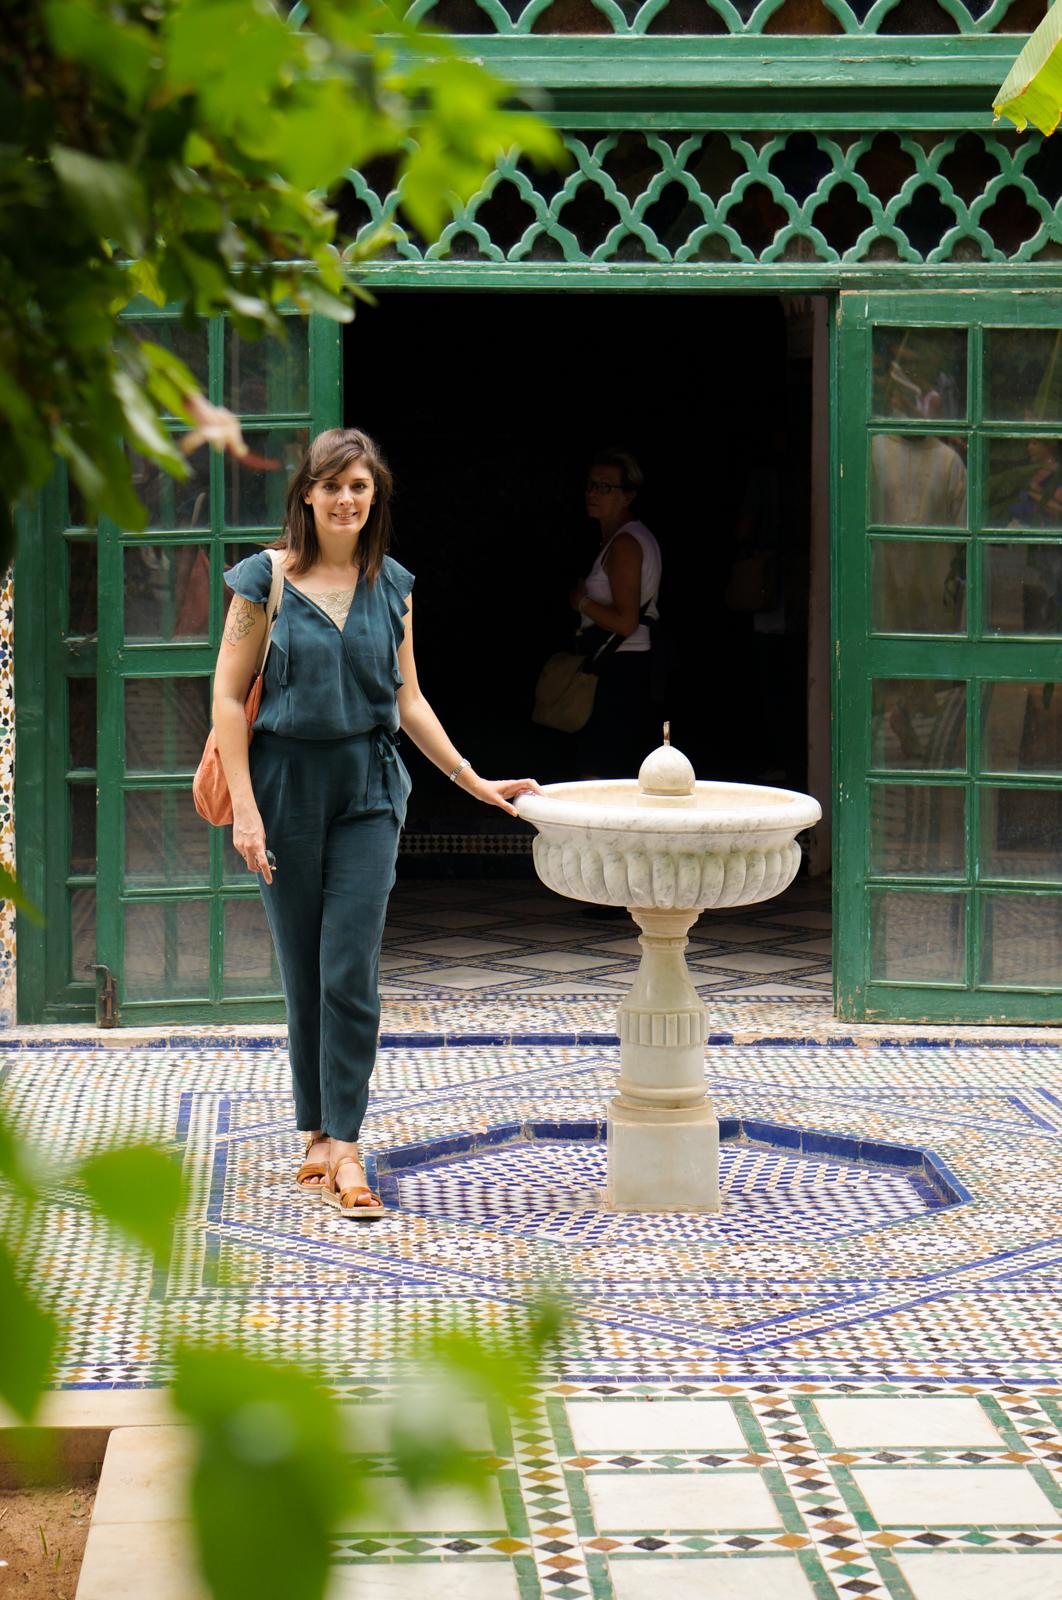 palais bahia, marrakech, city trip marrakech, city guide marrakech, grand week-end marrakech, idée balade marrakech, blog marrakech, blog marrakech 2019, vacances marrakech, séjour marrakech, voyage marrakech